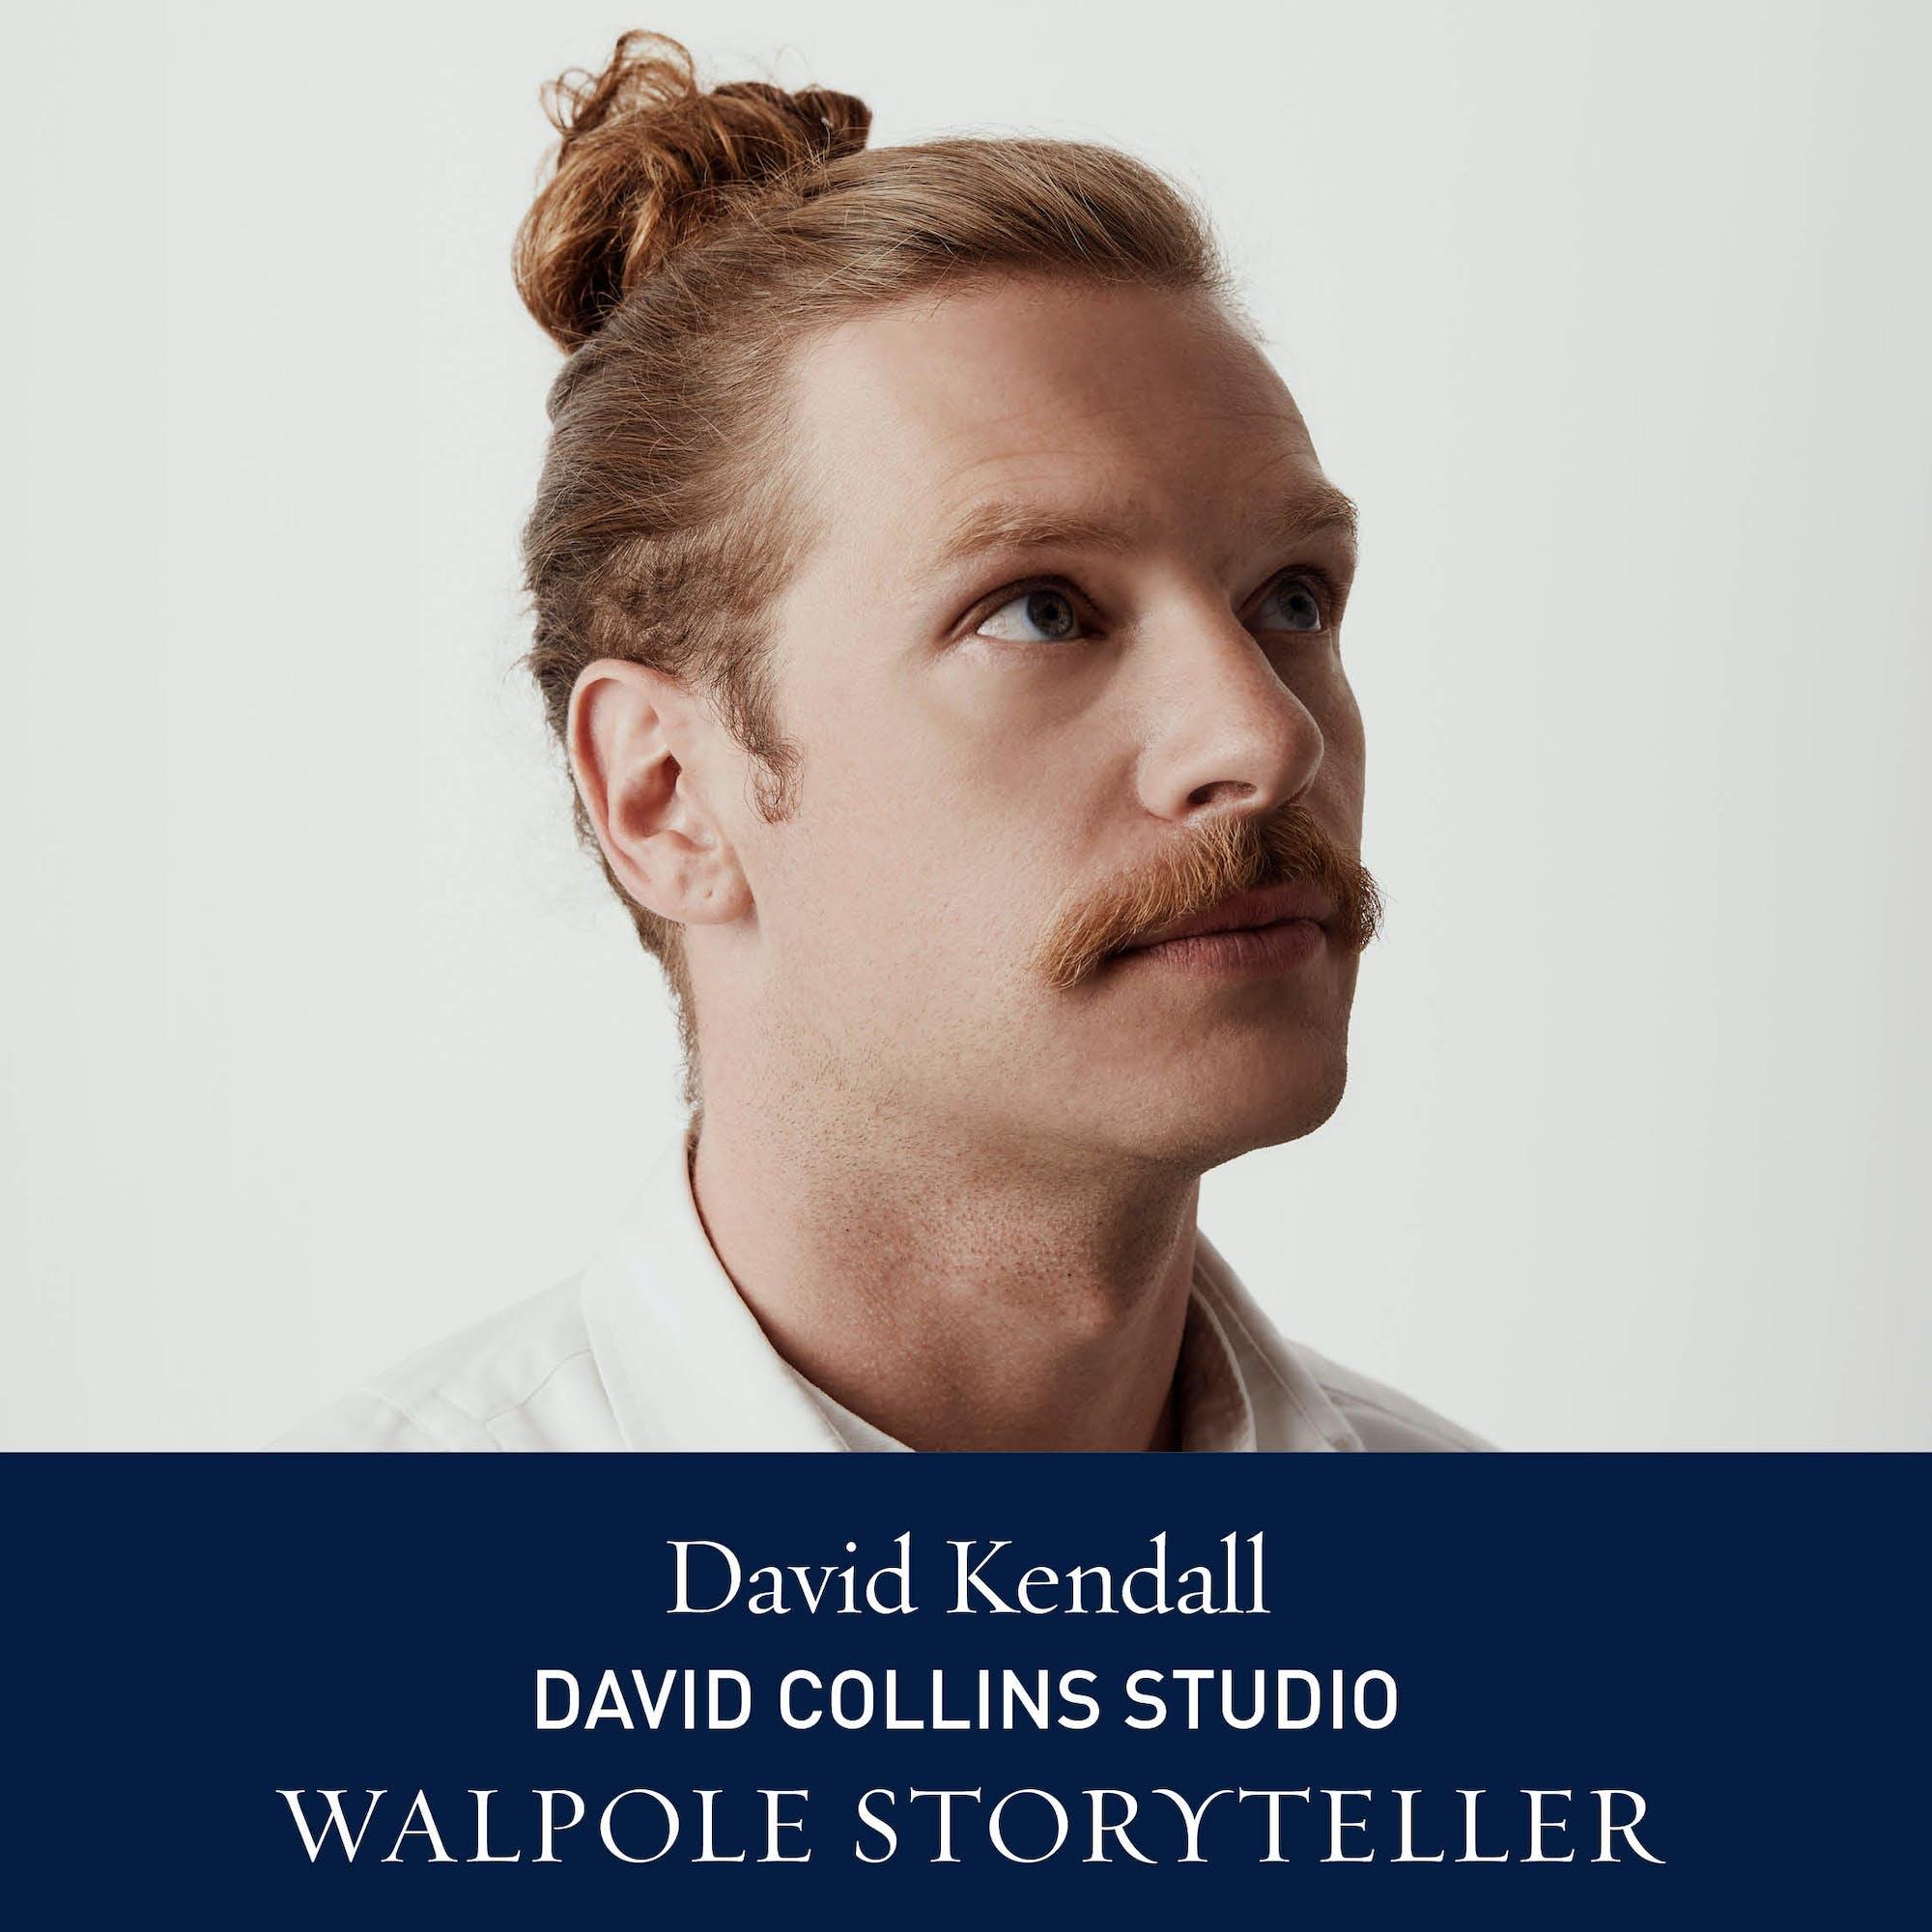 The Walpole Power List 2020  The Storytellers: David Kendall, Marketing & Communications Director at David Collins Studio